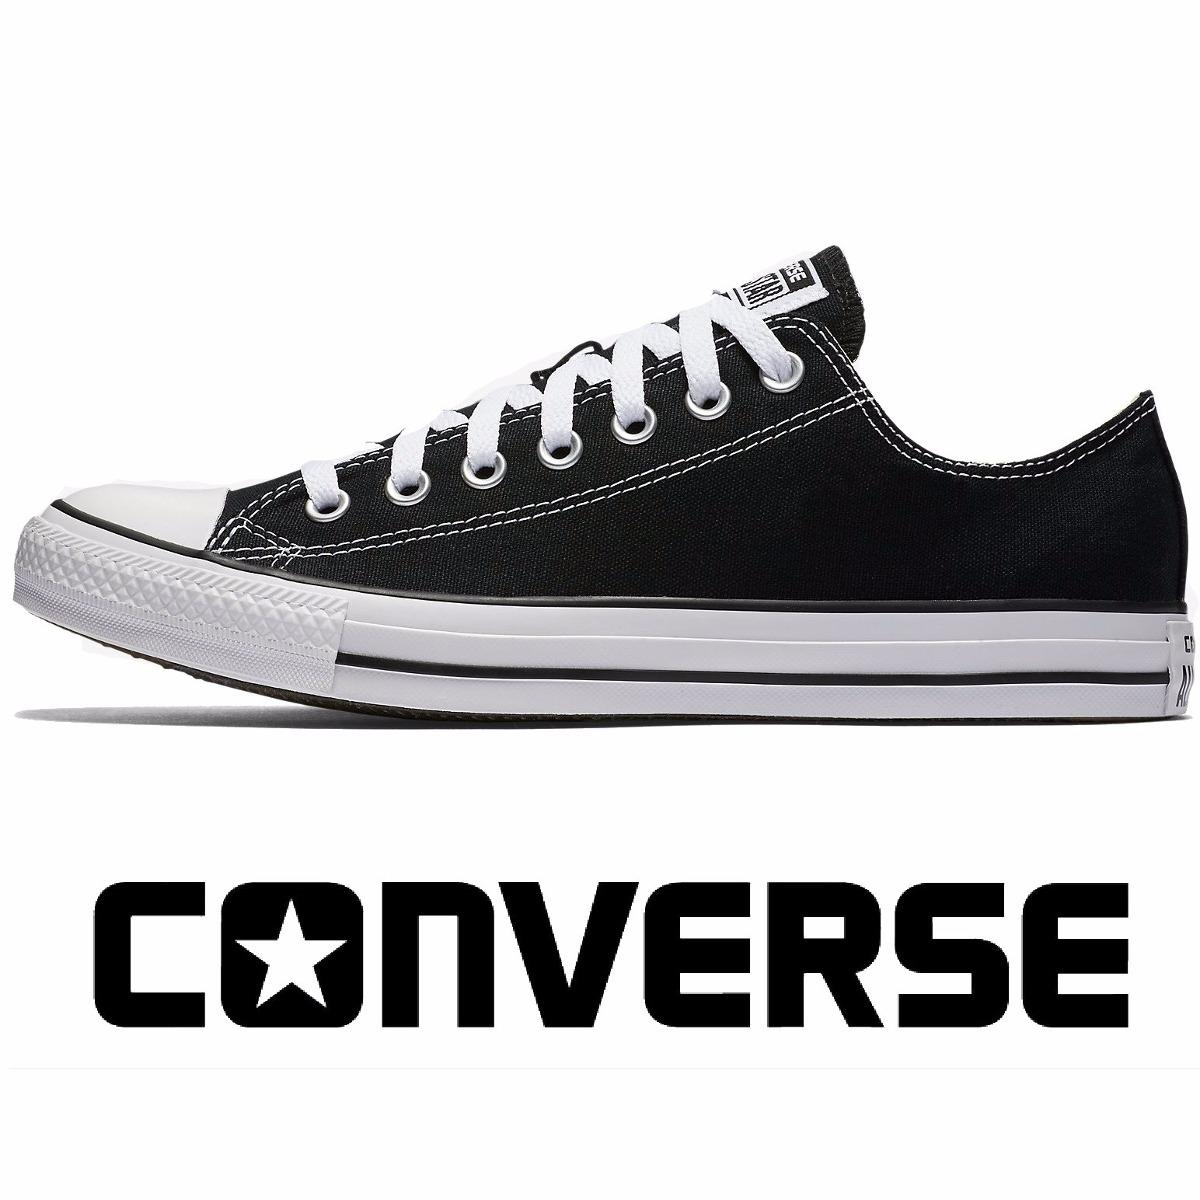 tênis converse all-star ct as core ox preto ct00010002. Carregando zoom. b86b9559fadb8